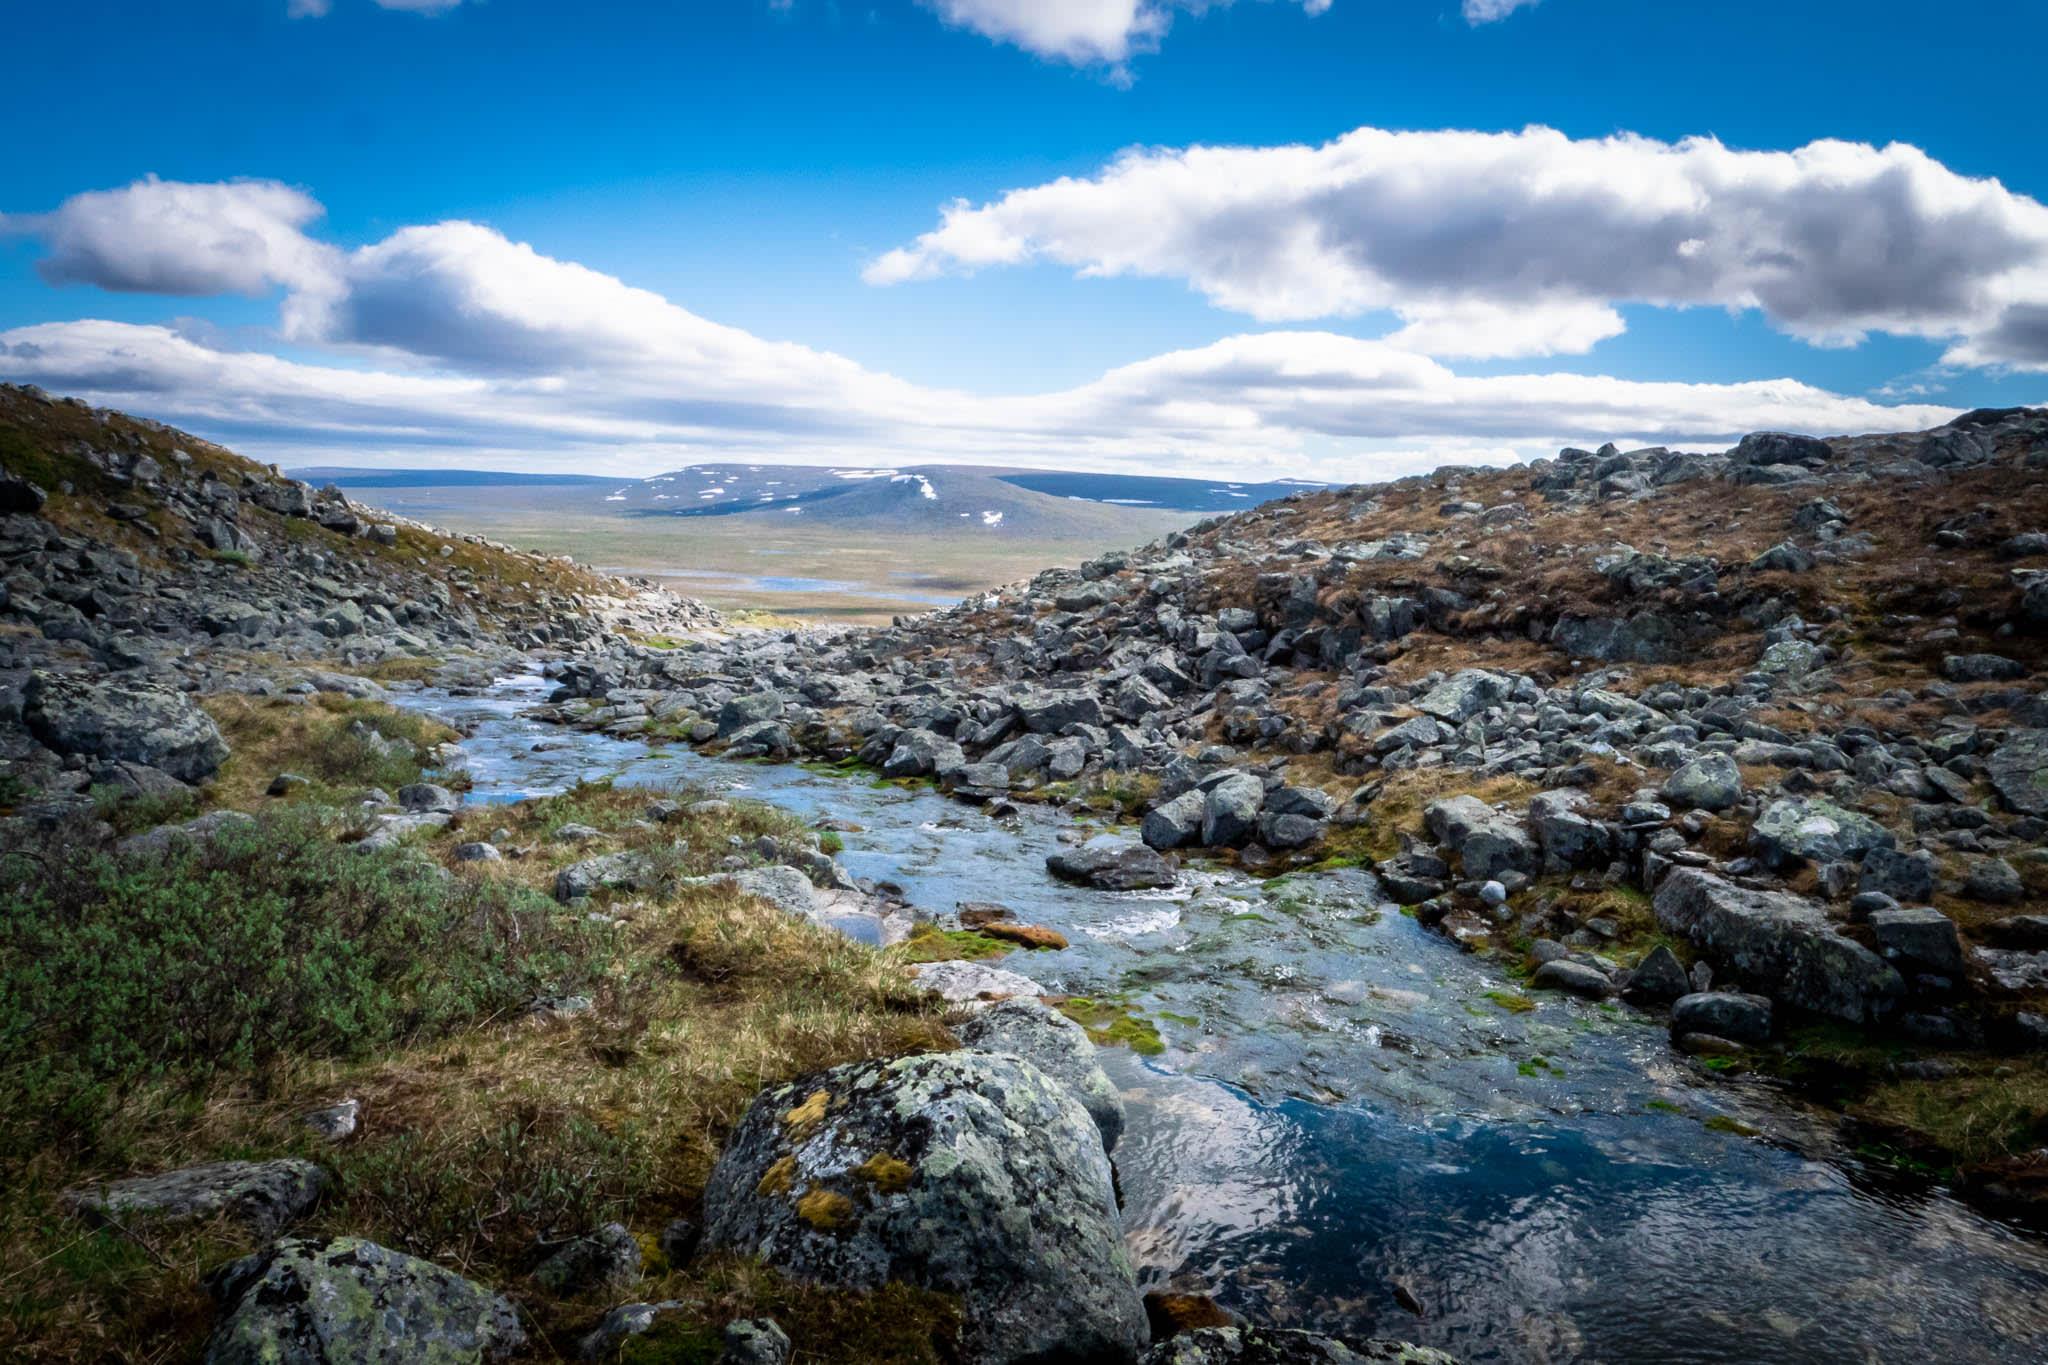 Nordic Nature Stream and Rocks